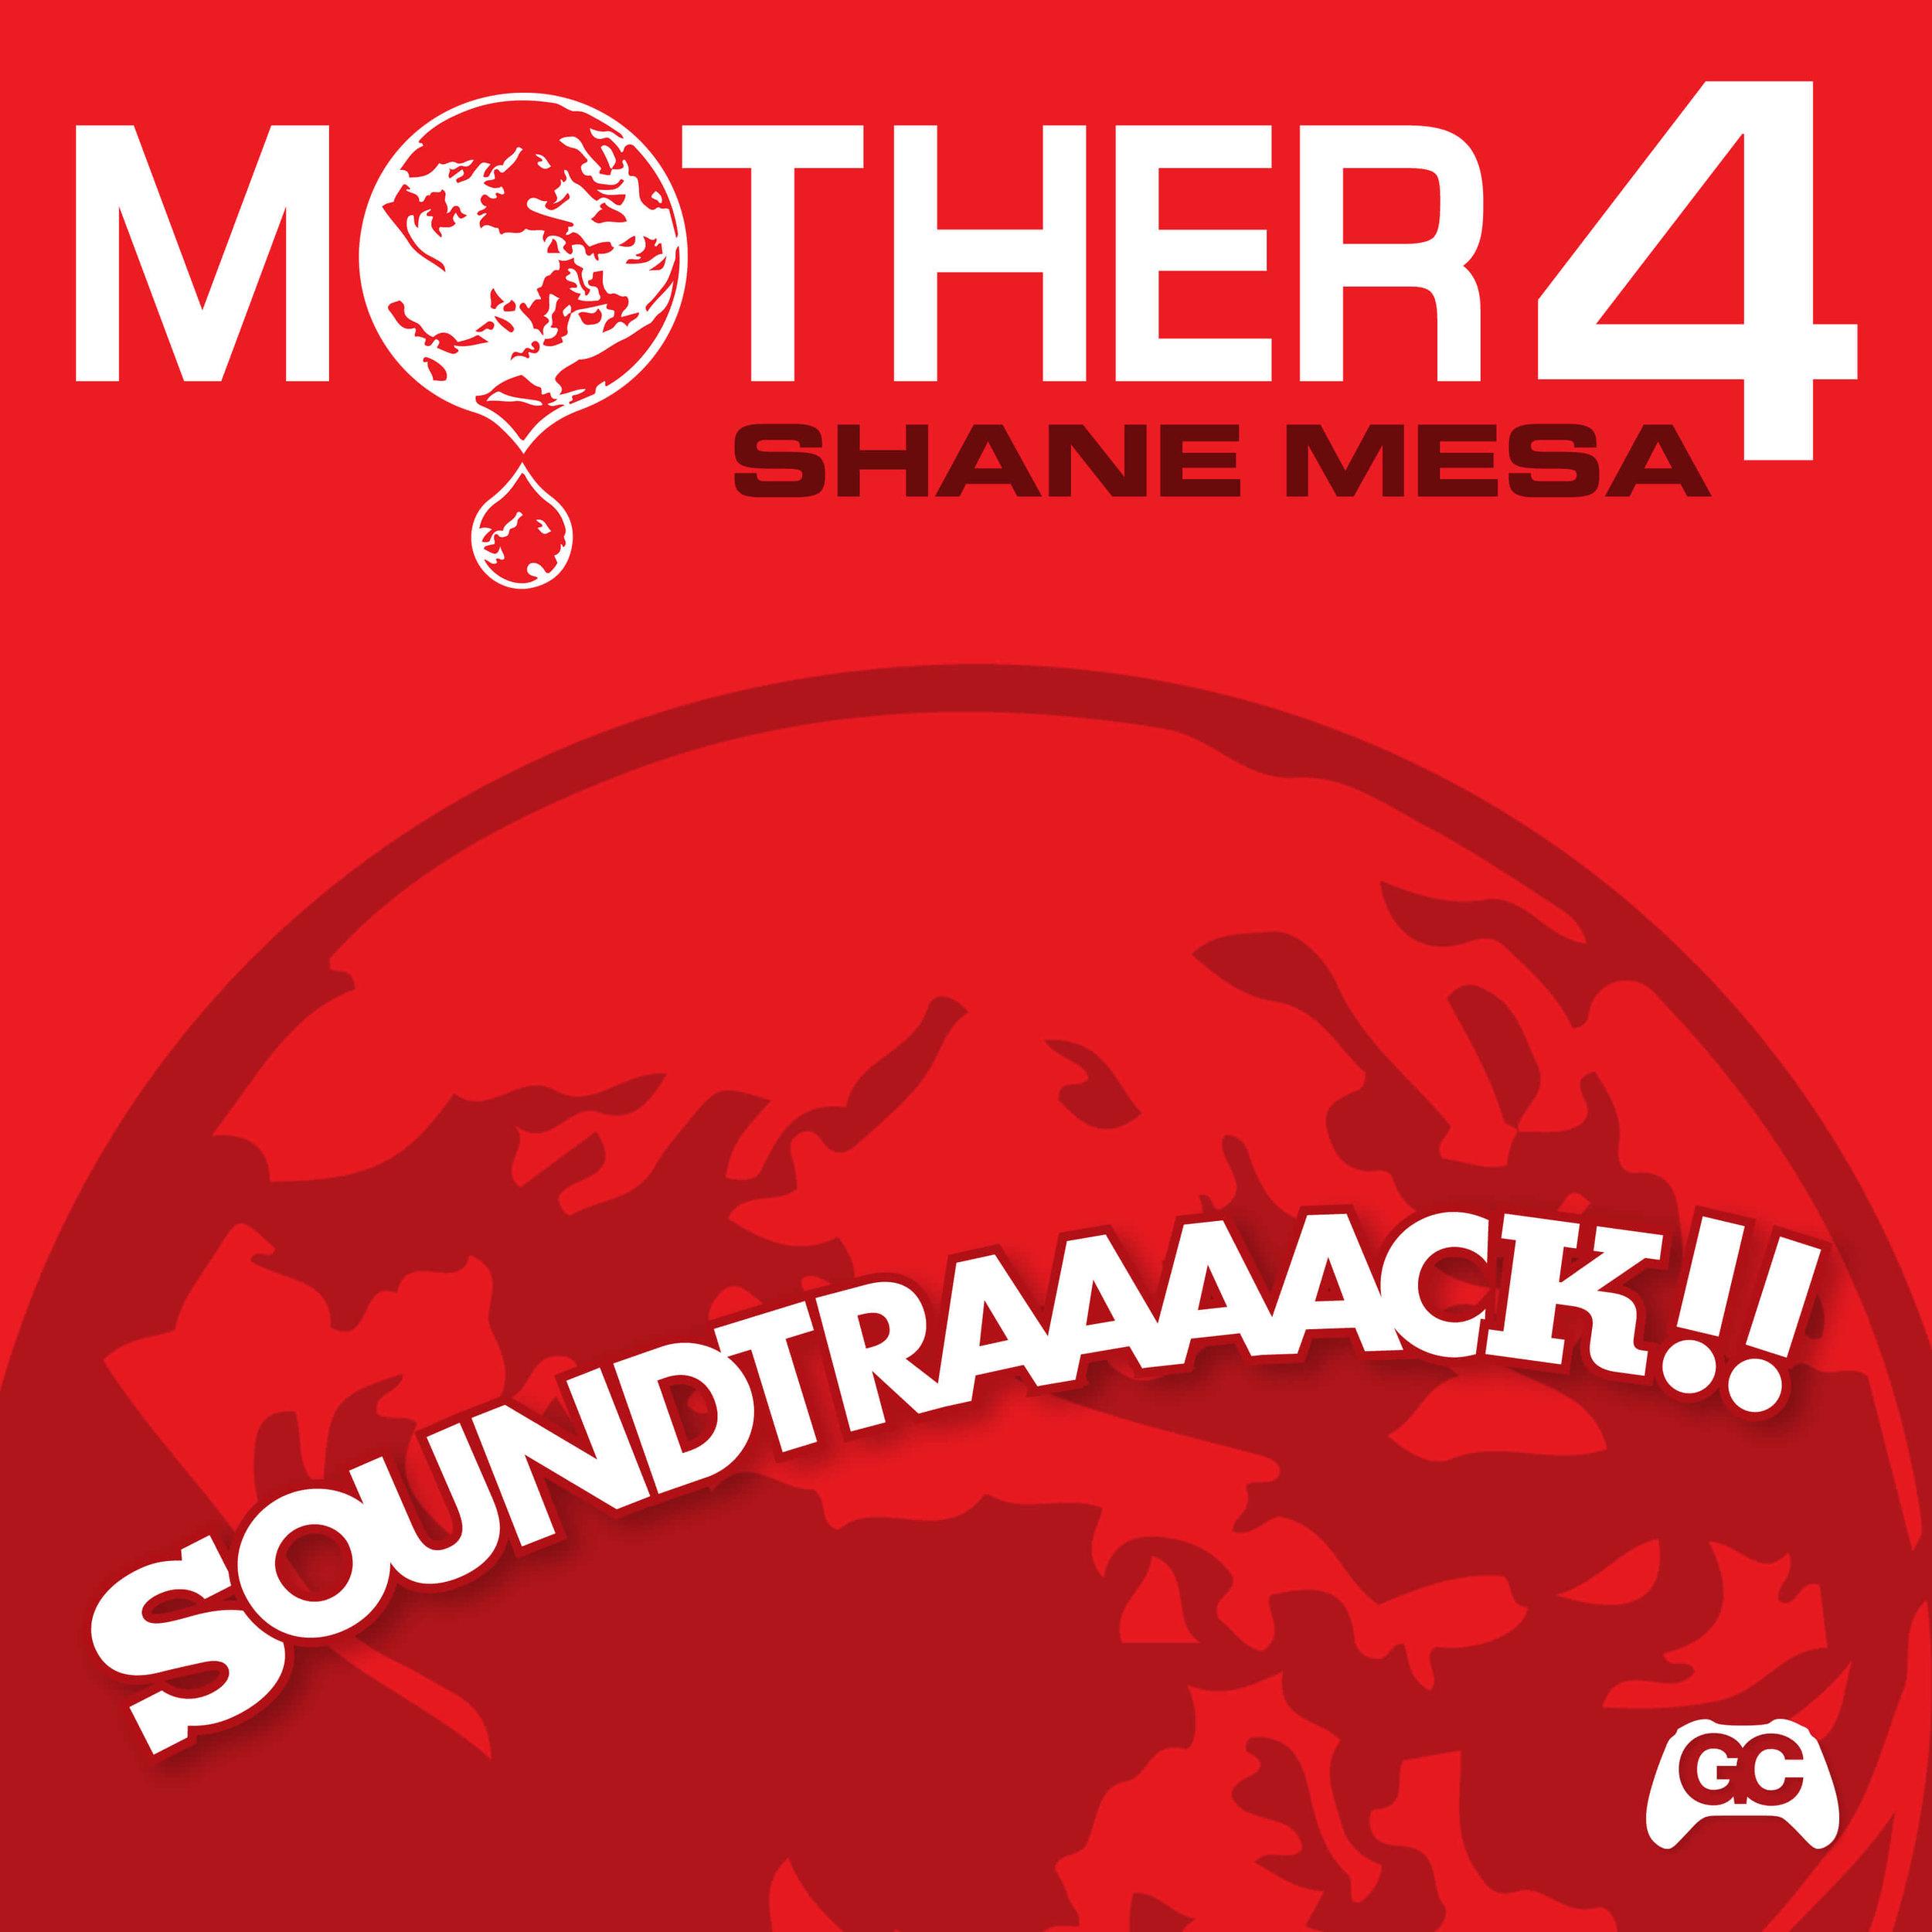 Shane Mesa - Mother 4 Soundtraaaack!!.jpg